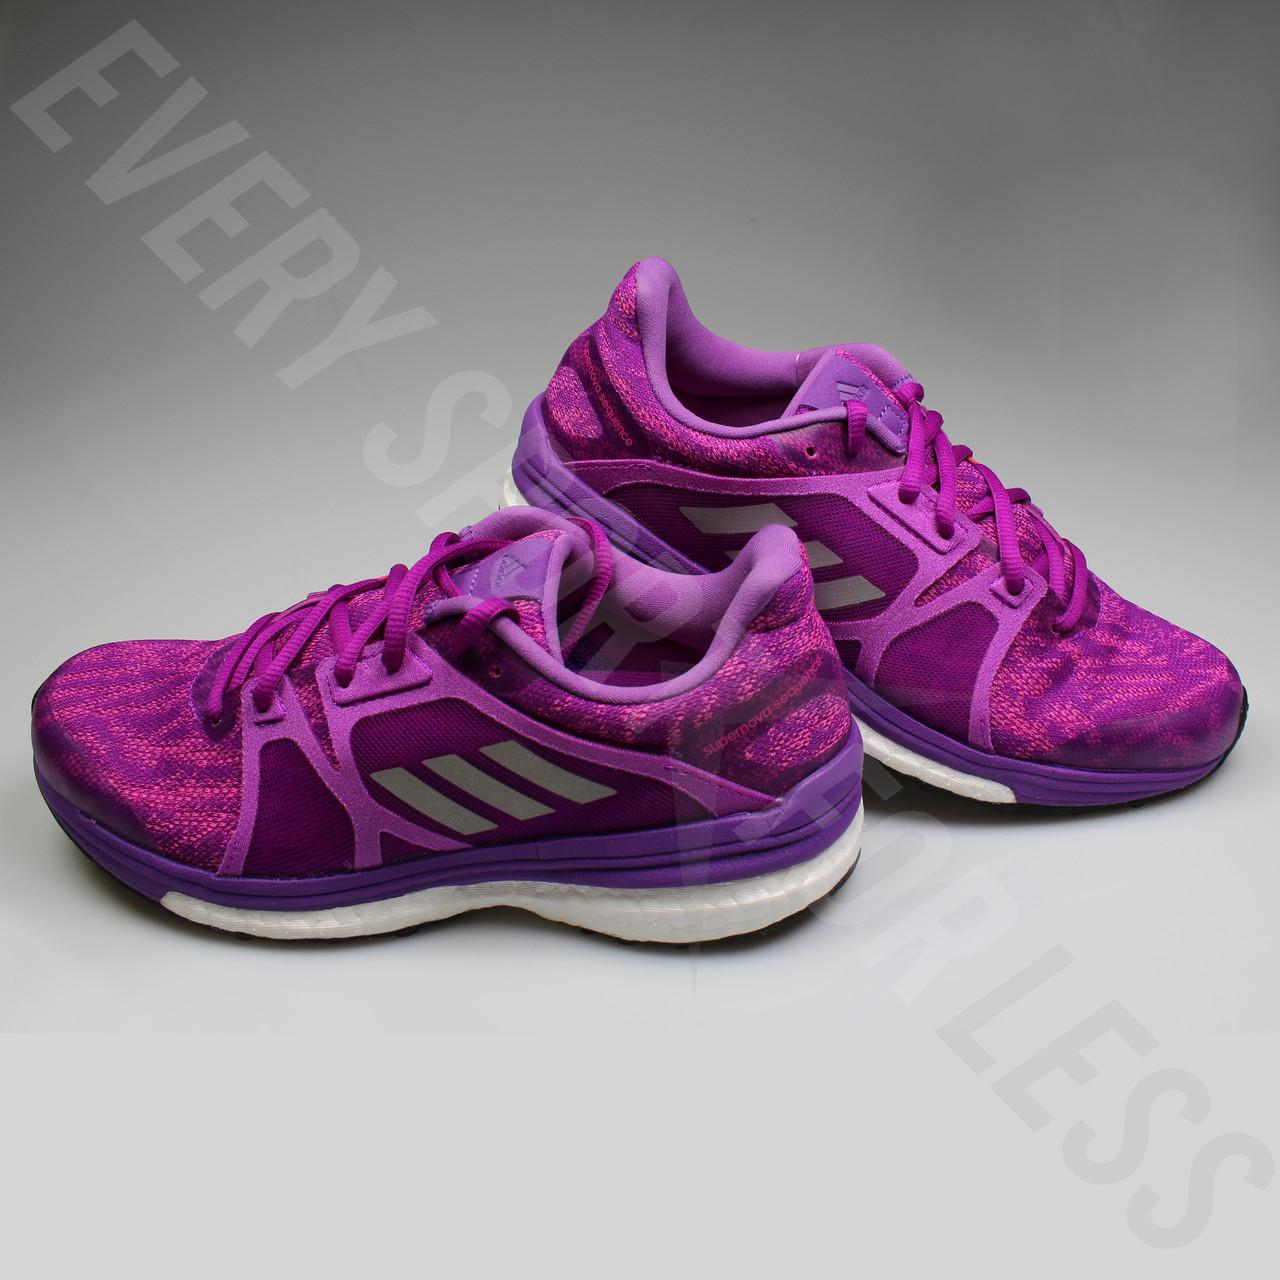 5aa0b457d4122 ... Adidas Supernova Sequence 9 Women s Running Shoes AQ3548 - Purple ...